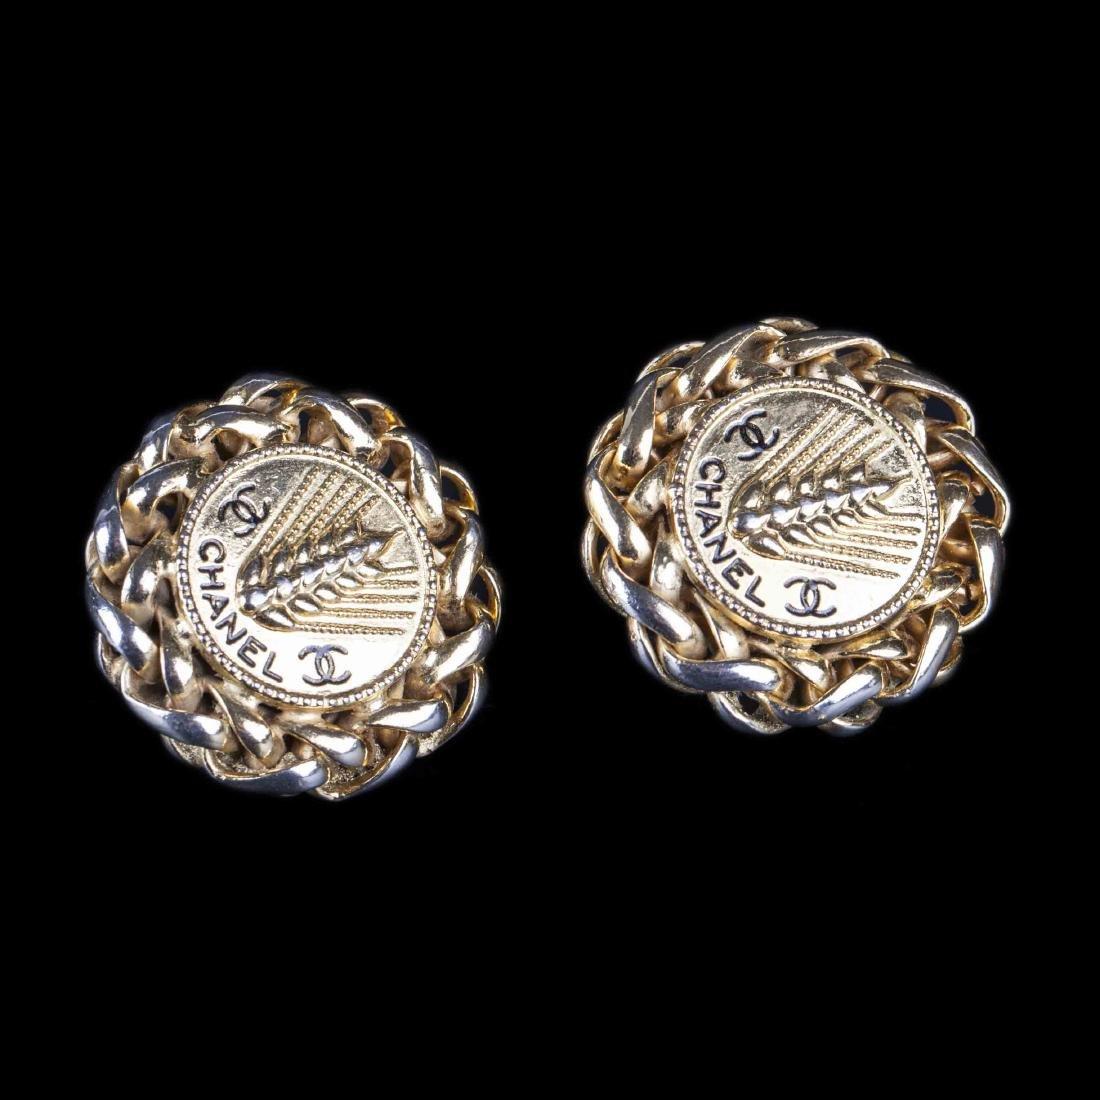 Chanel vintage wheat sheaf clip on earrings (80's-early